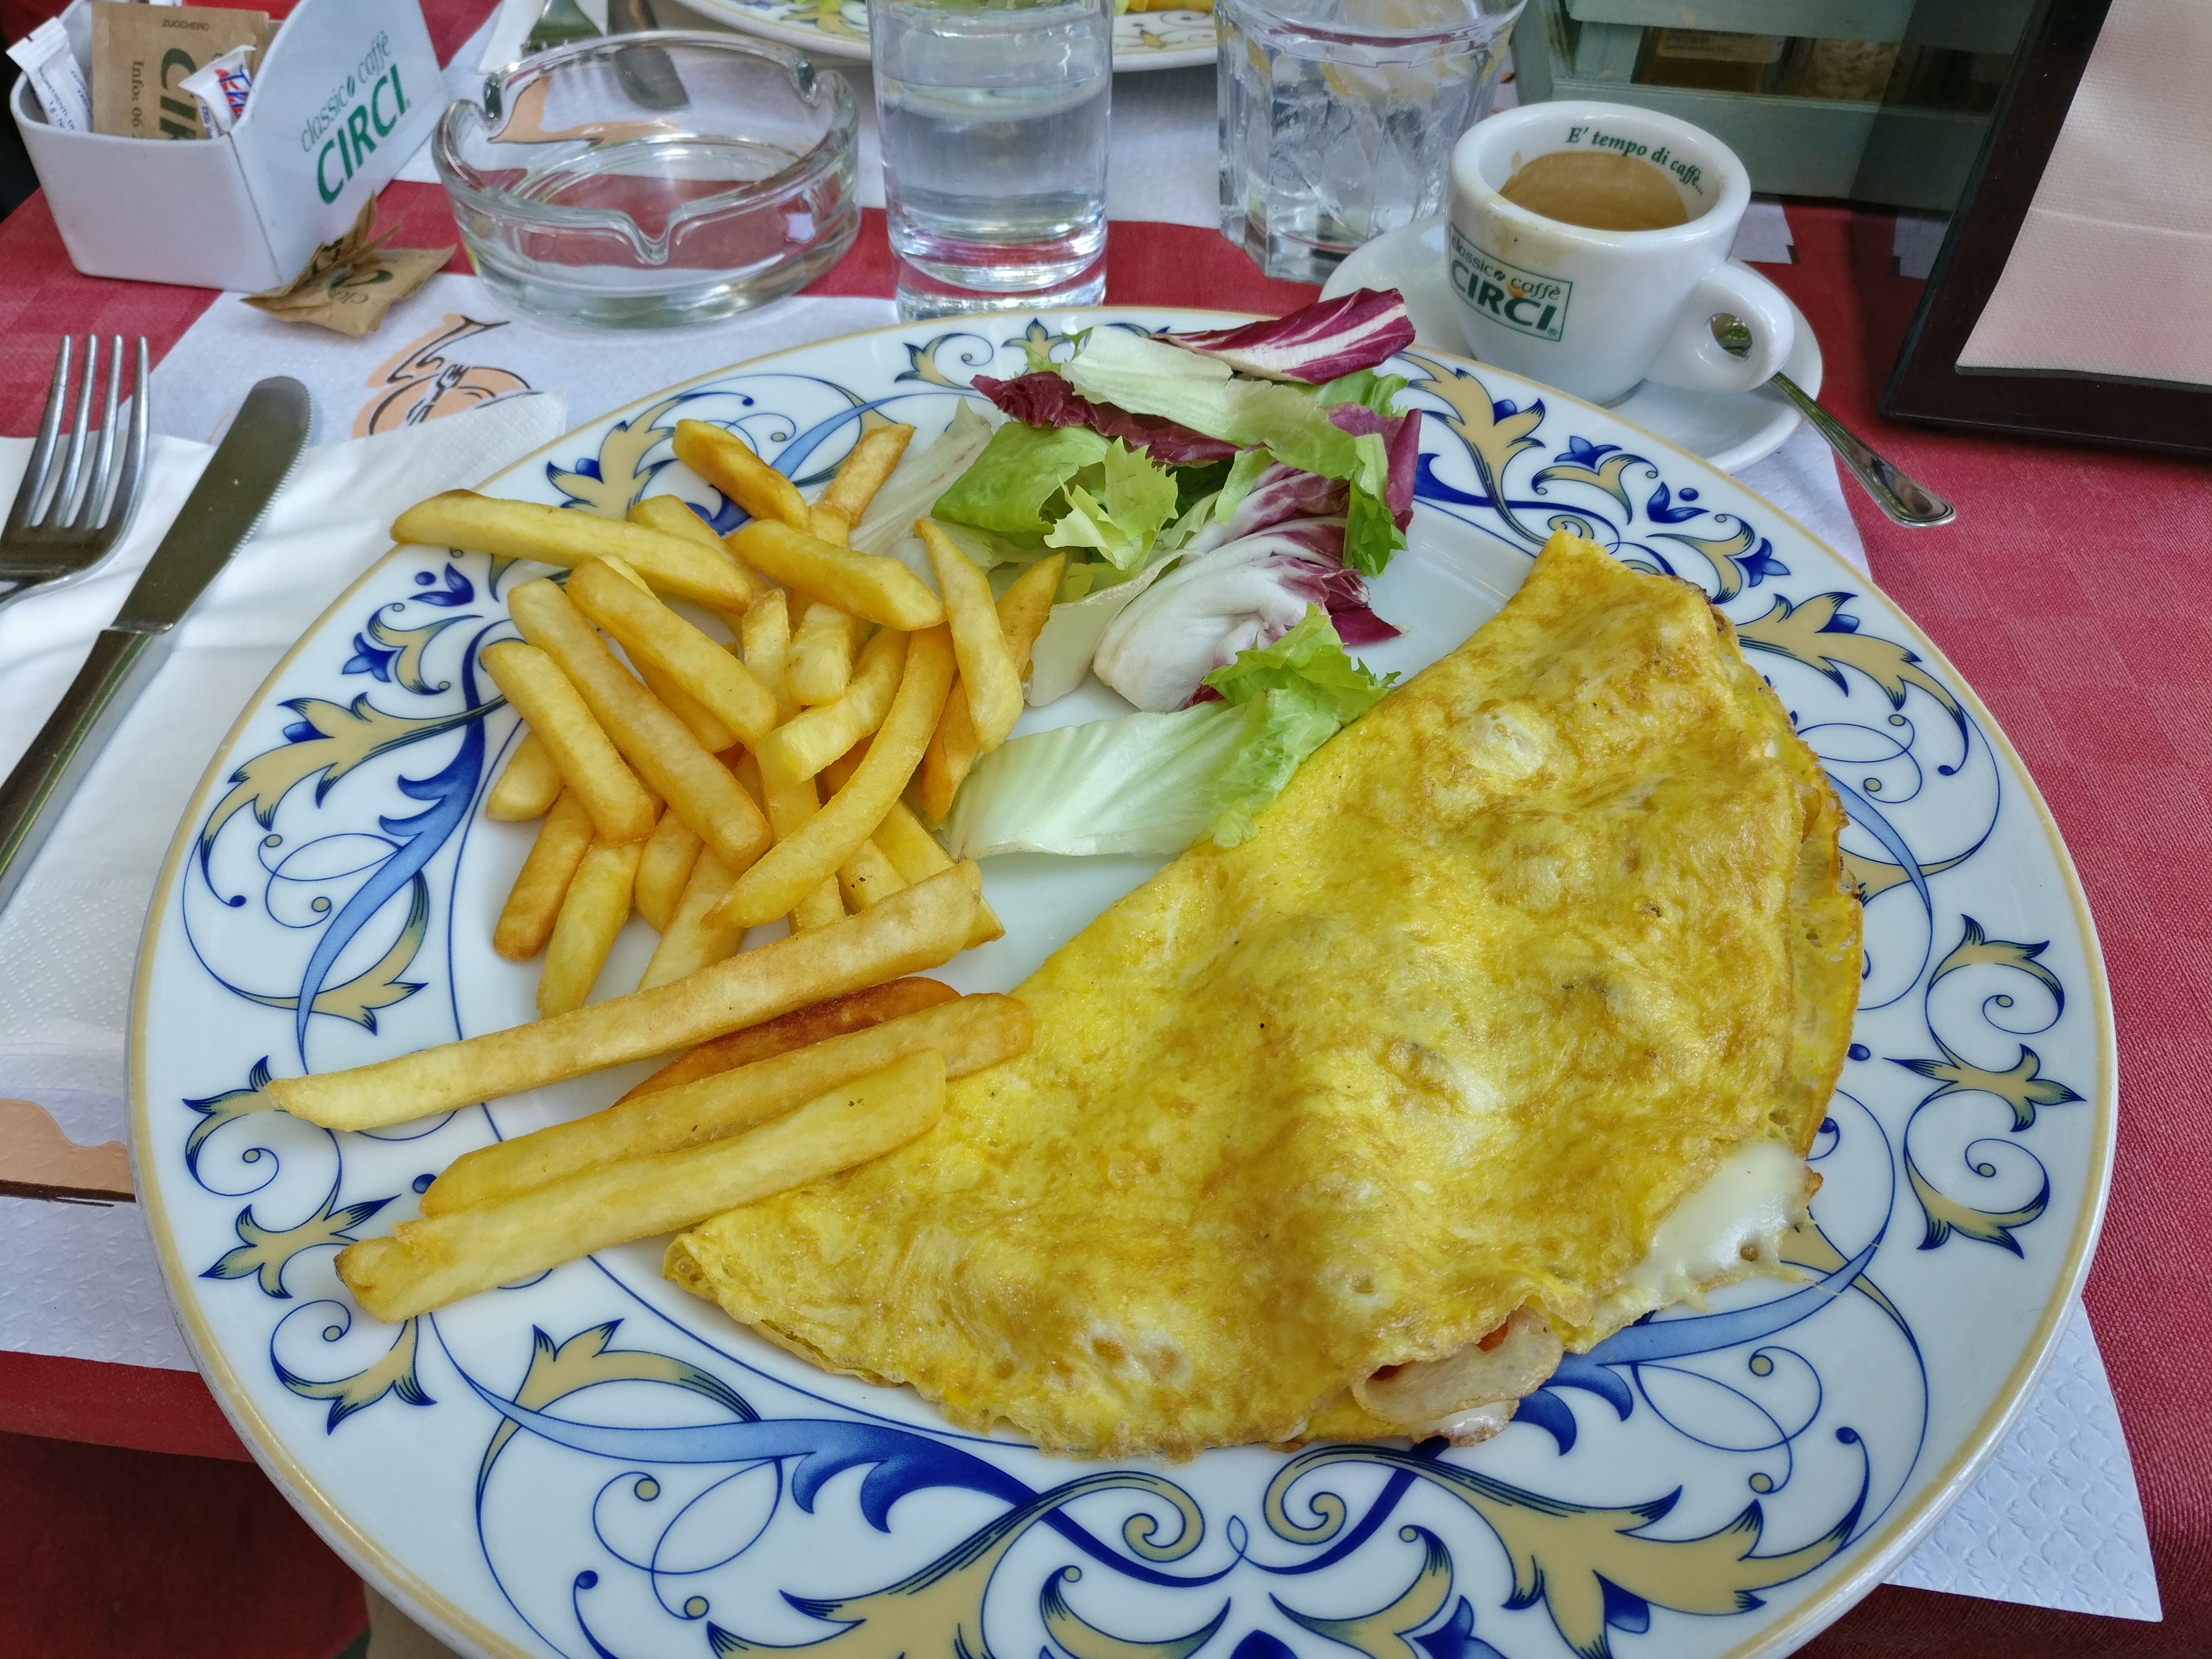 http://foodloader.net/nico_2017-04-24_omlett-mit-kaese-schinken-und-pommes.jpg